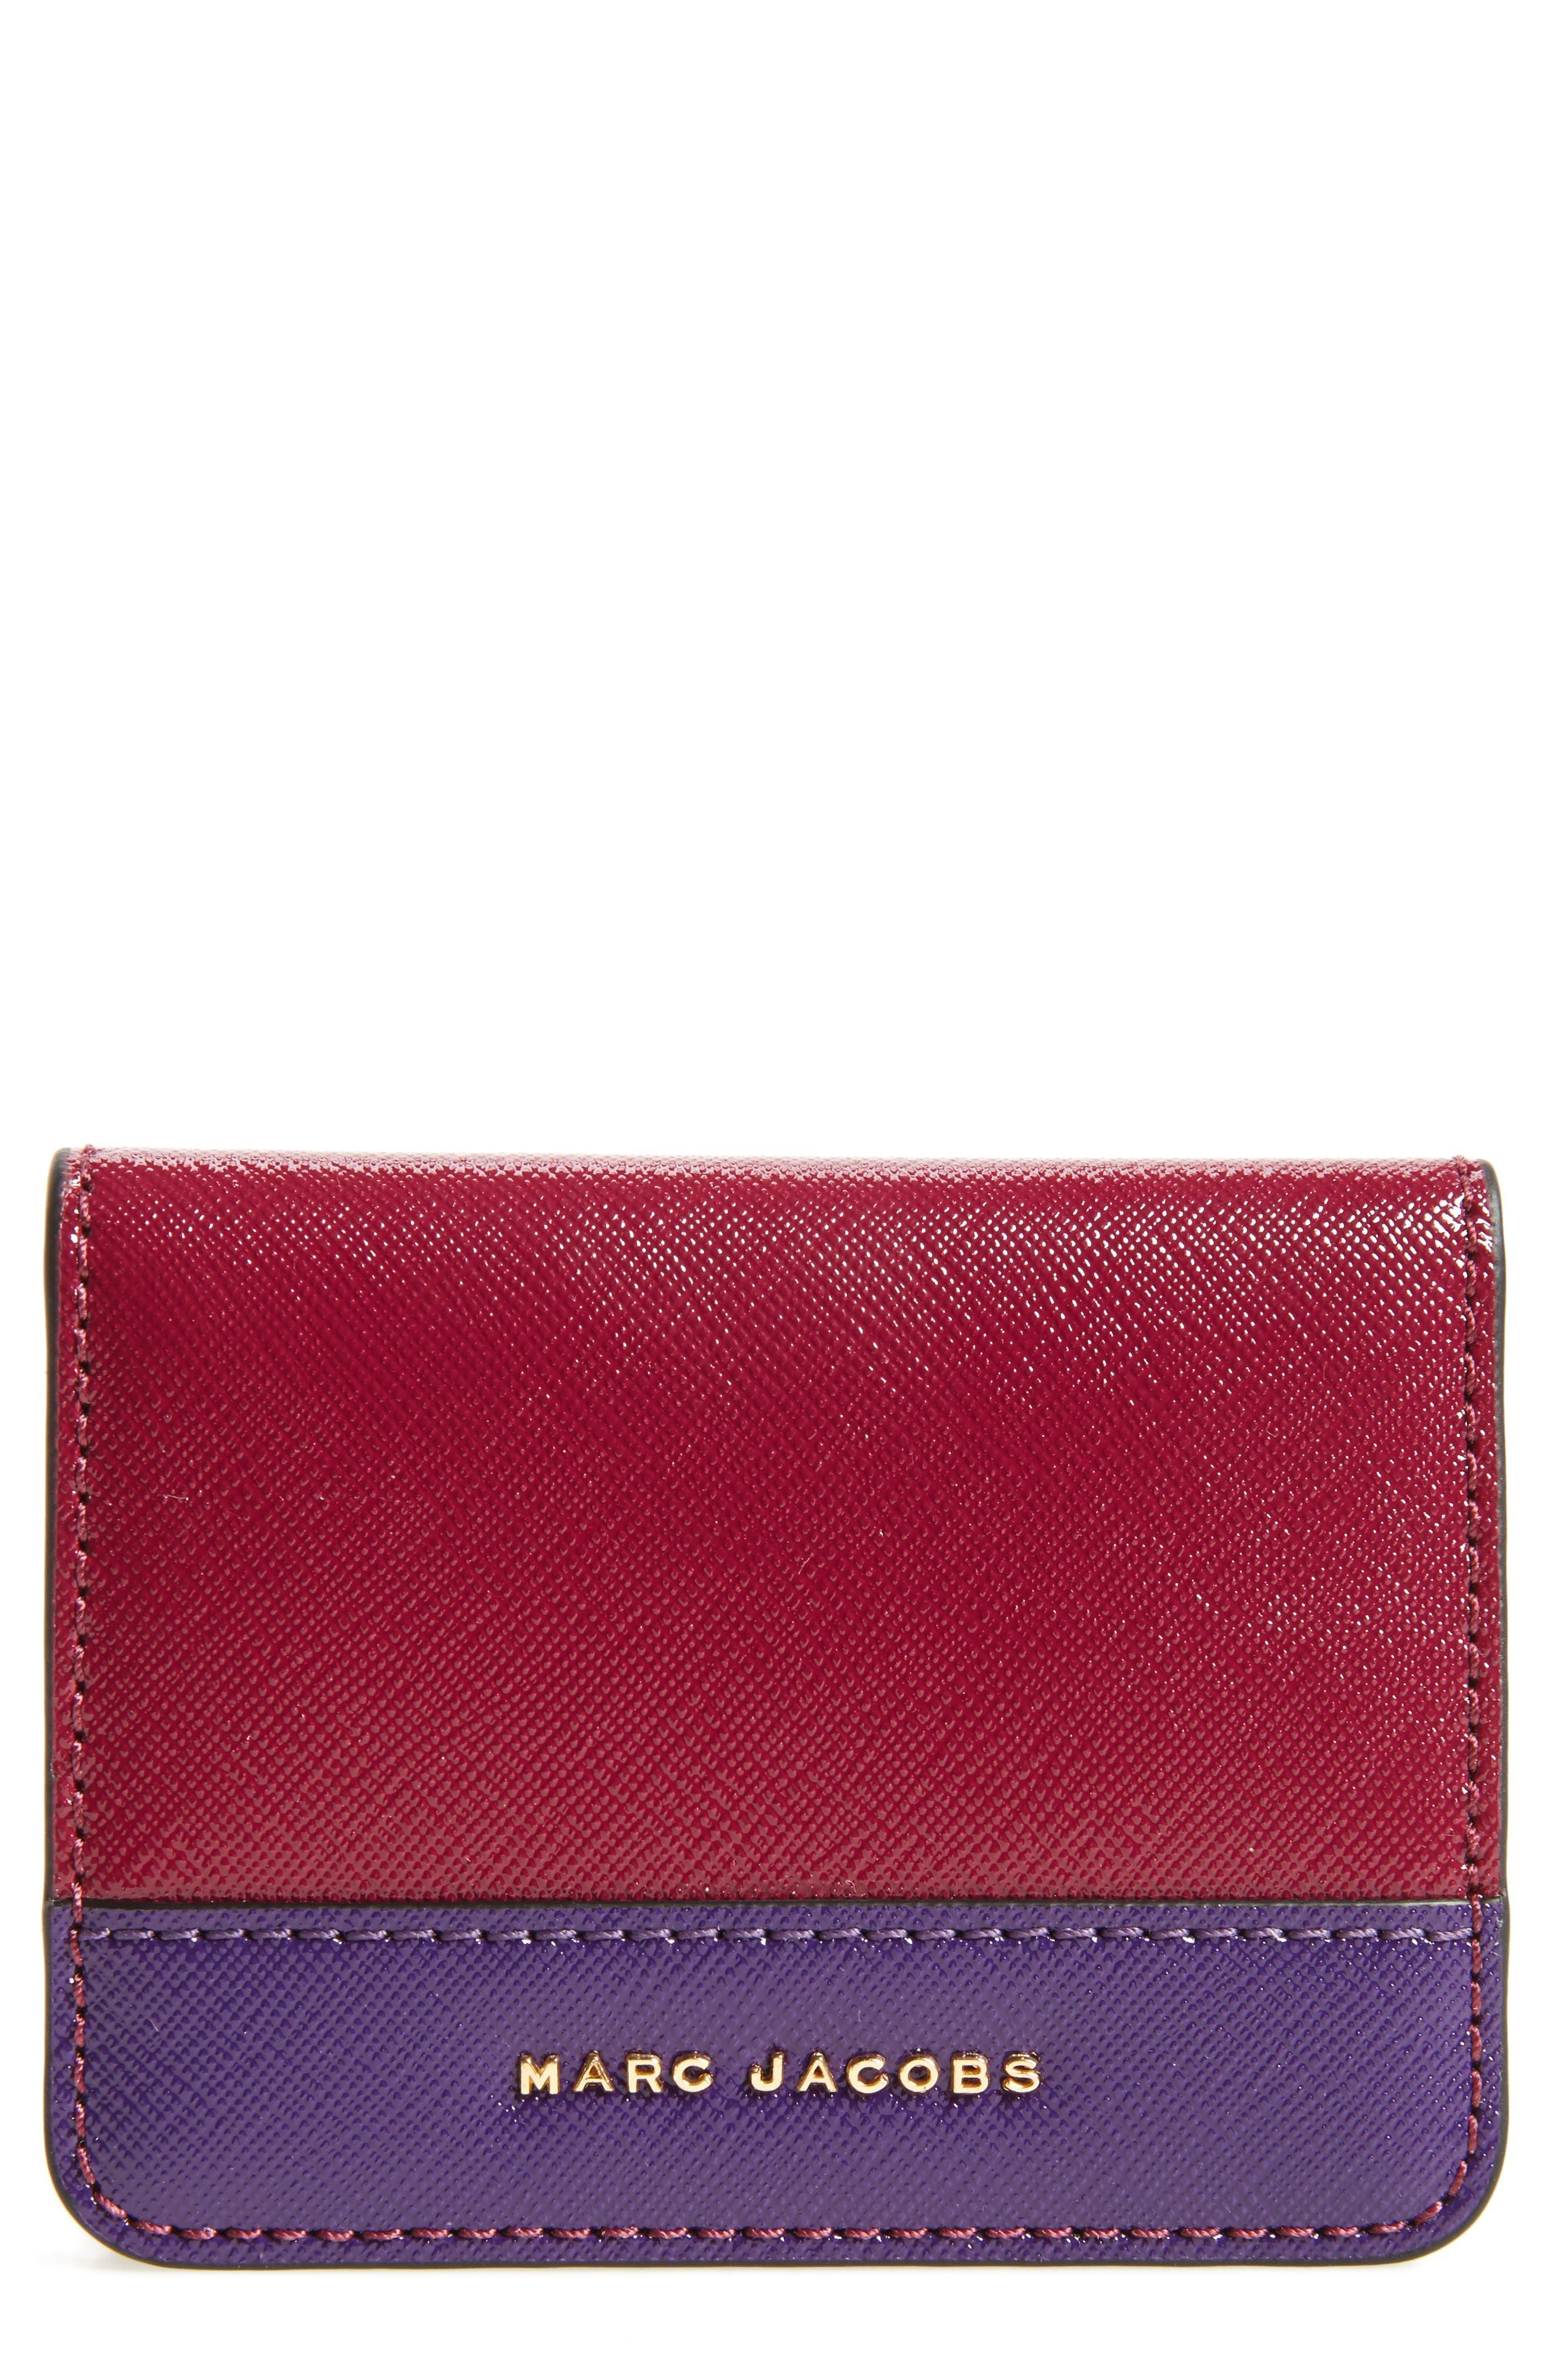 MARC JACOBS Color Block Saffiano Leather Business Card Case